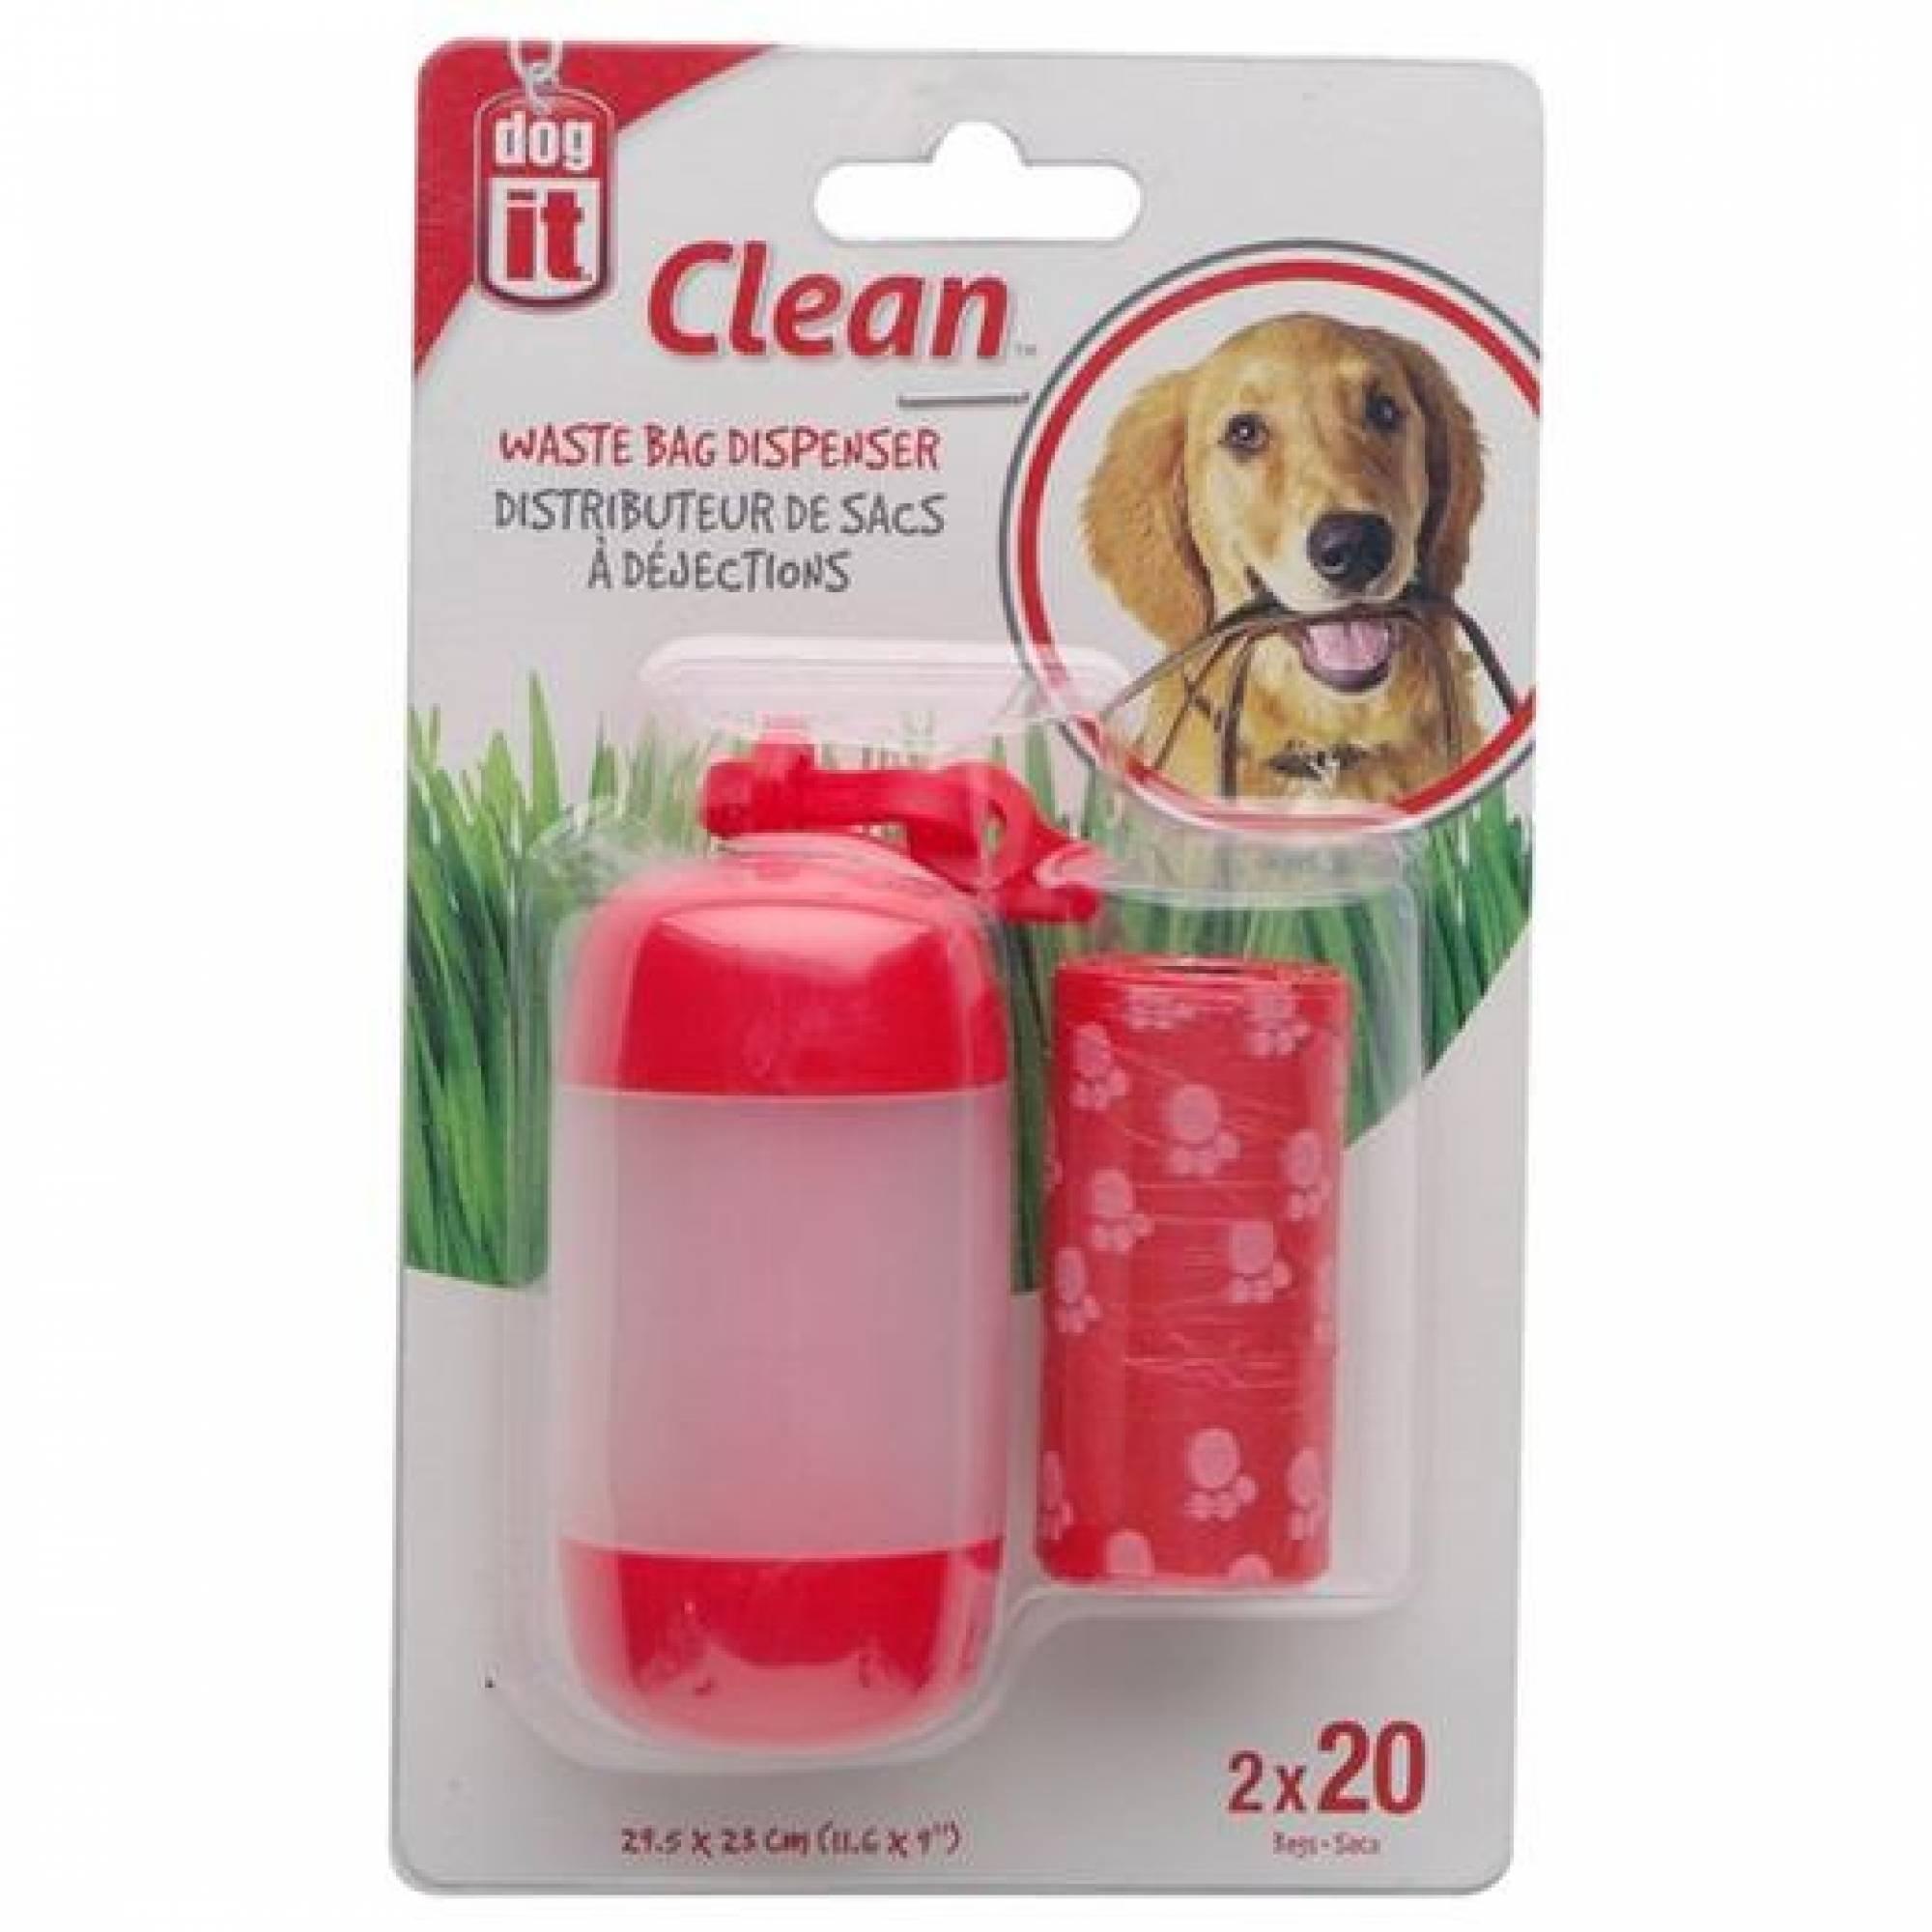 DogIt Clean Waste Bag Dispenser Red 2 Rolls / 20 Bags